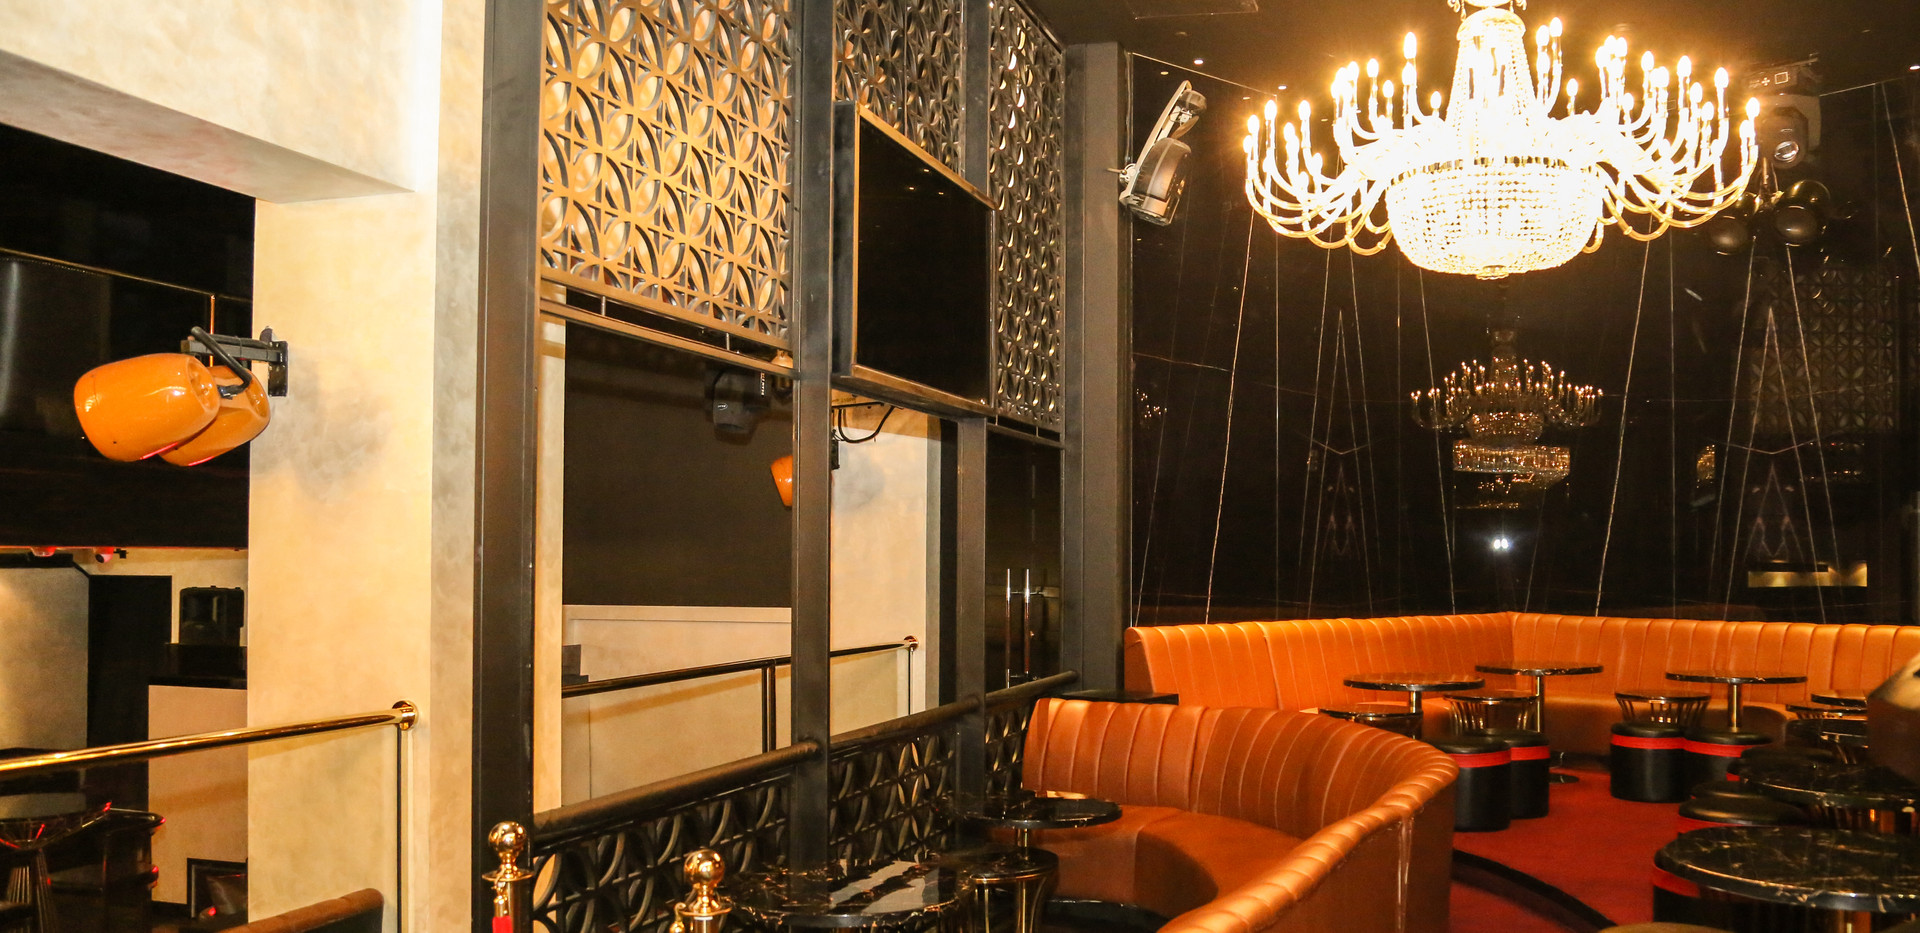 Enish Restaurant & Lounge Dubai.jpg.jpg